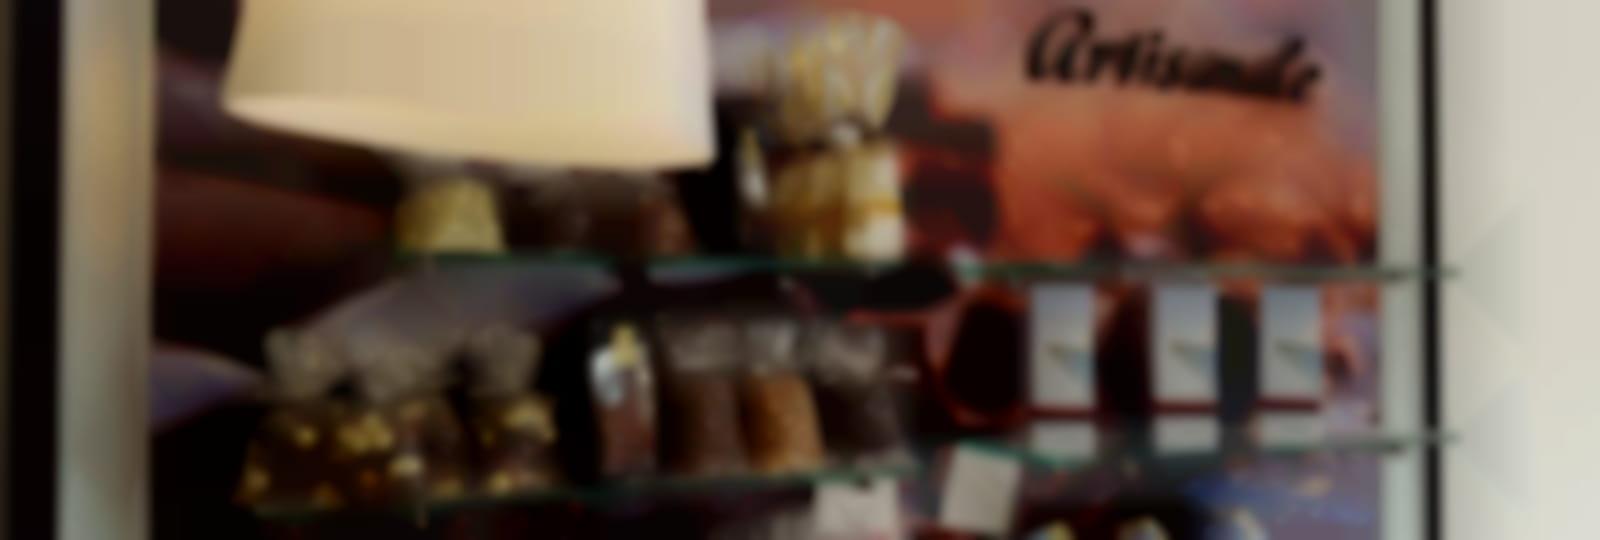 Boulangerie Morel